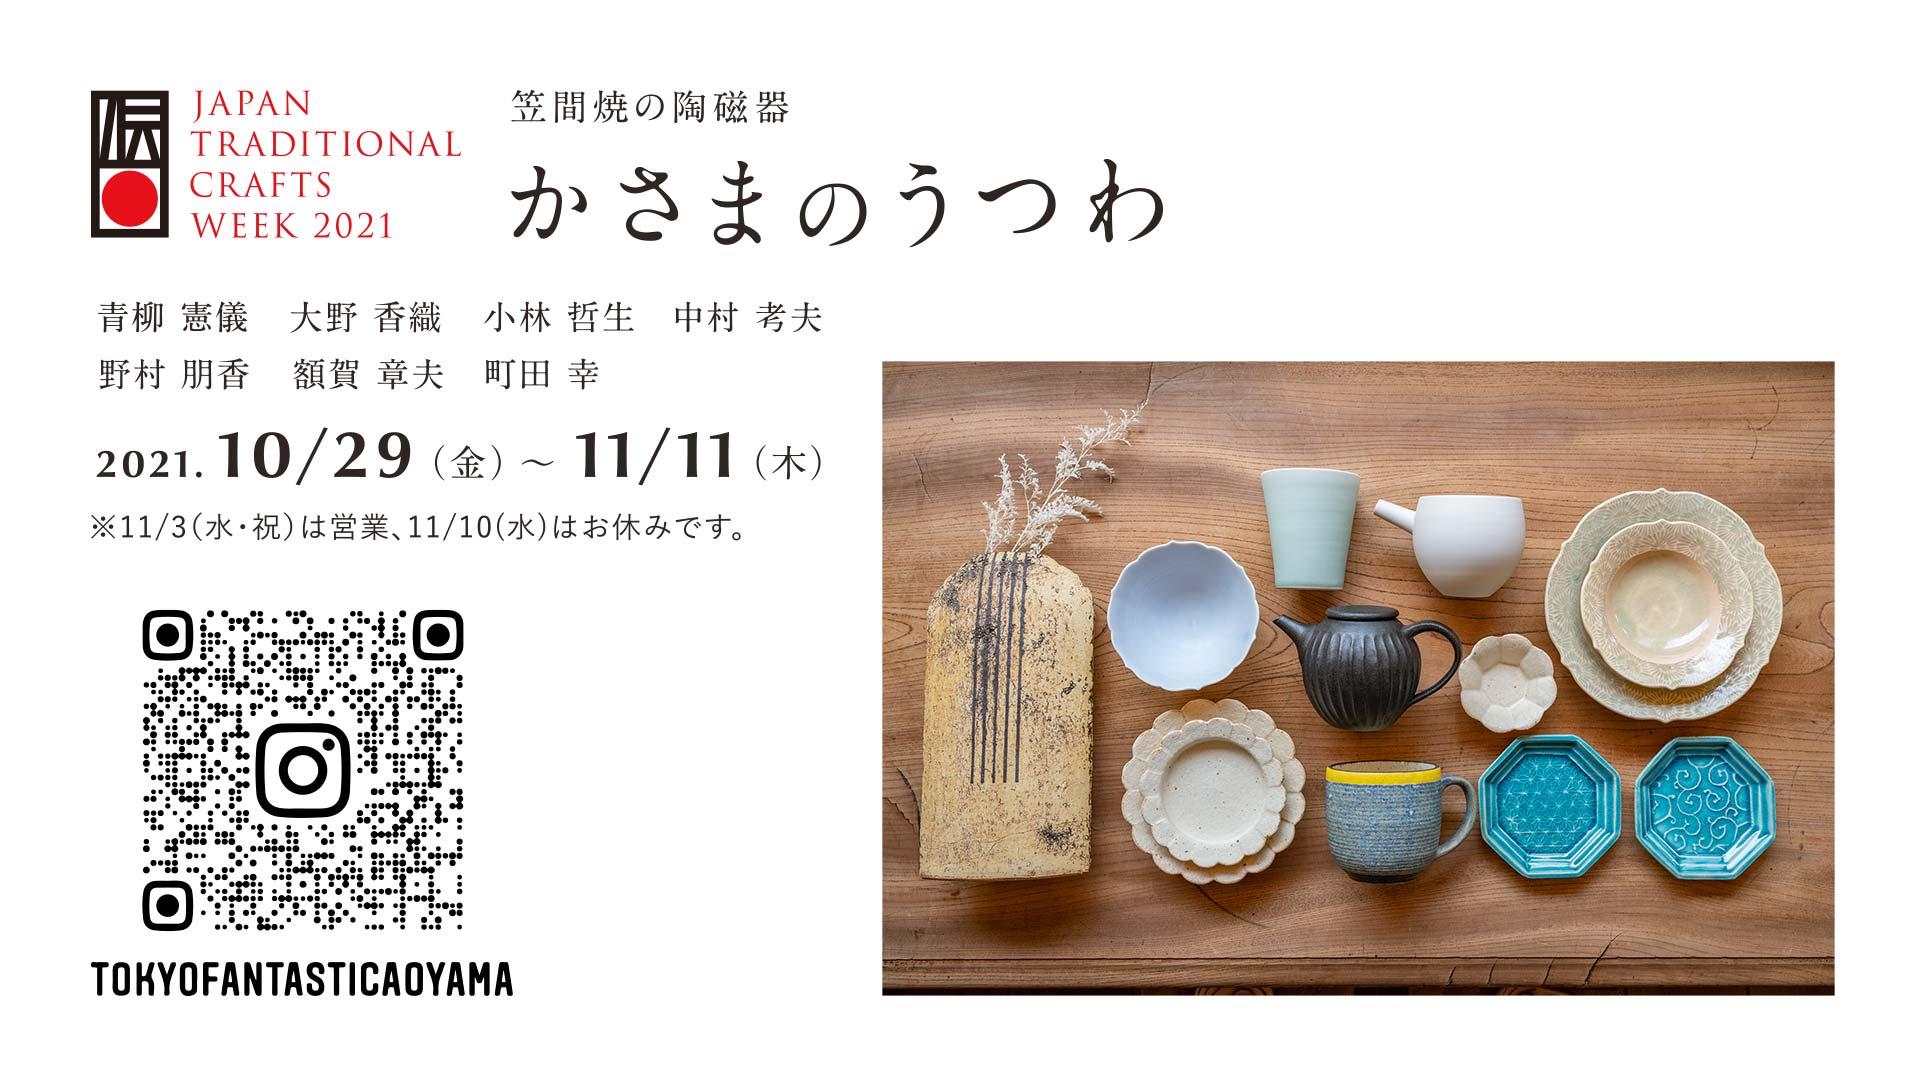 JTCW2021「かさまのうつわ(笠間焼の陶磁器)」開催!